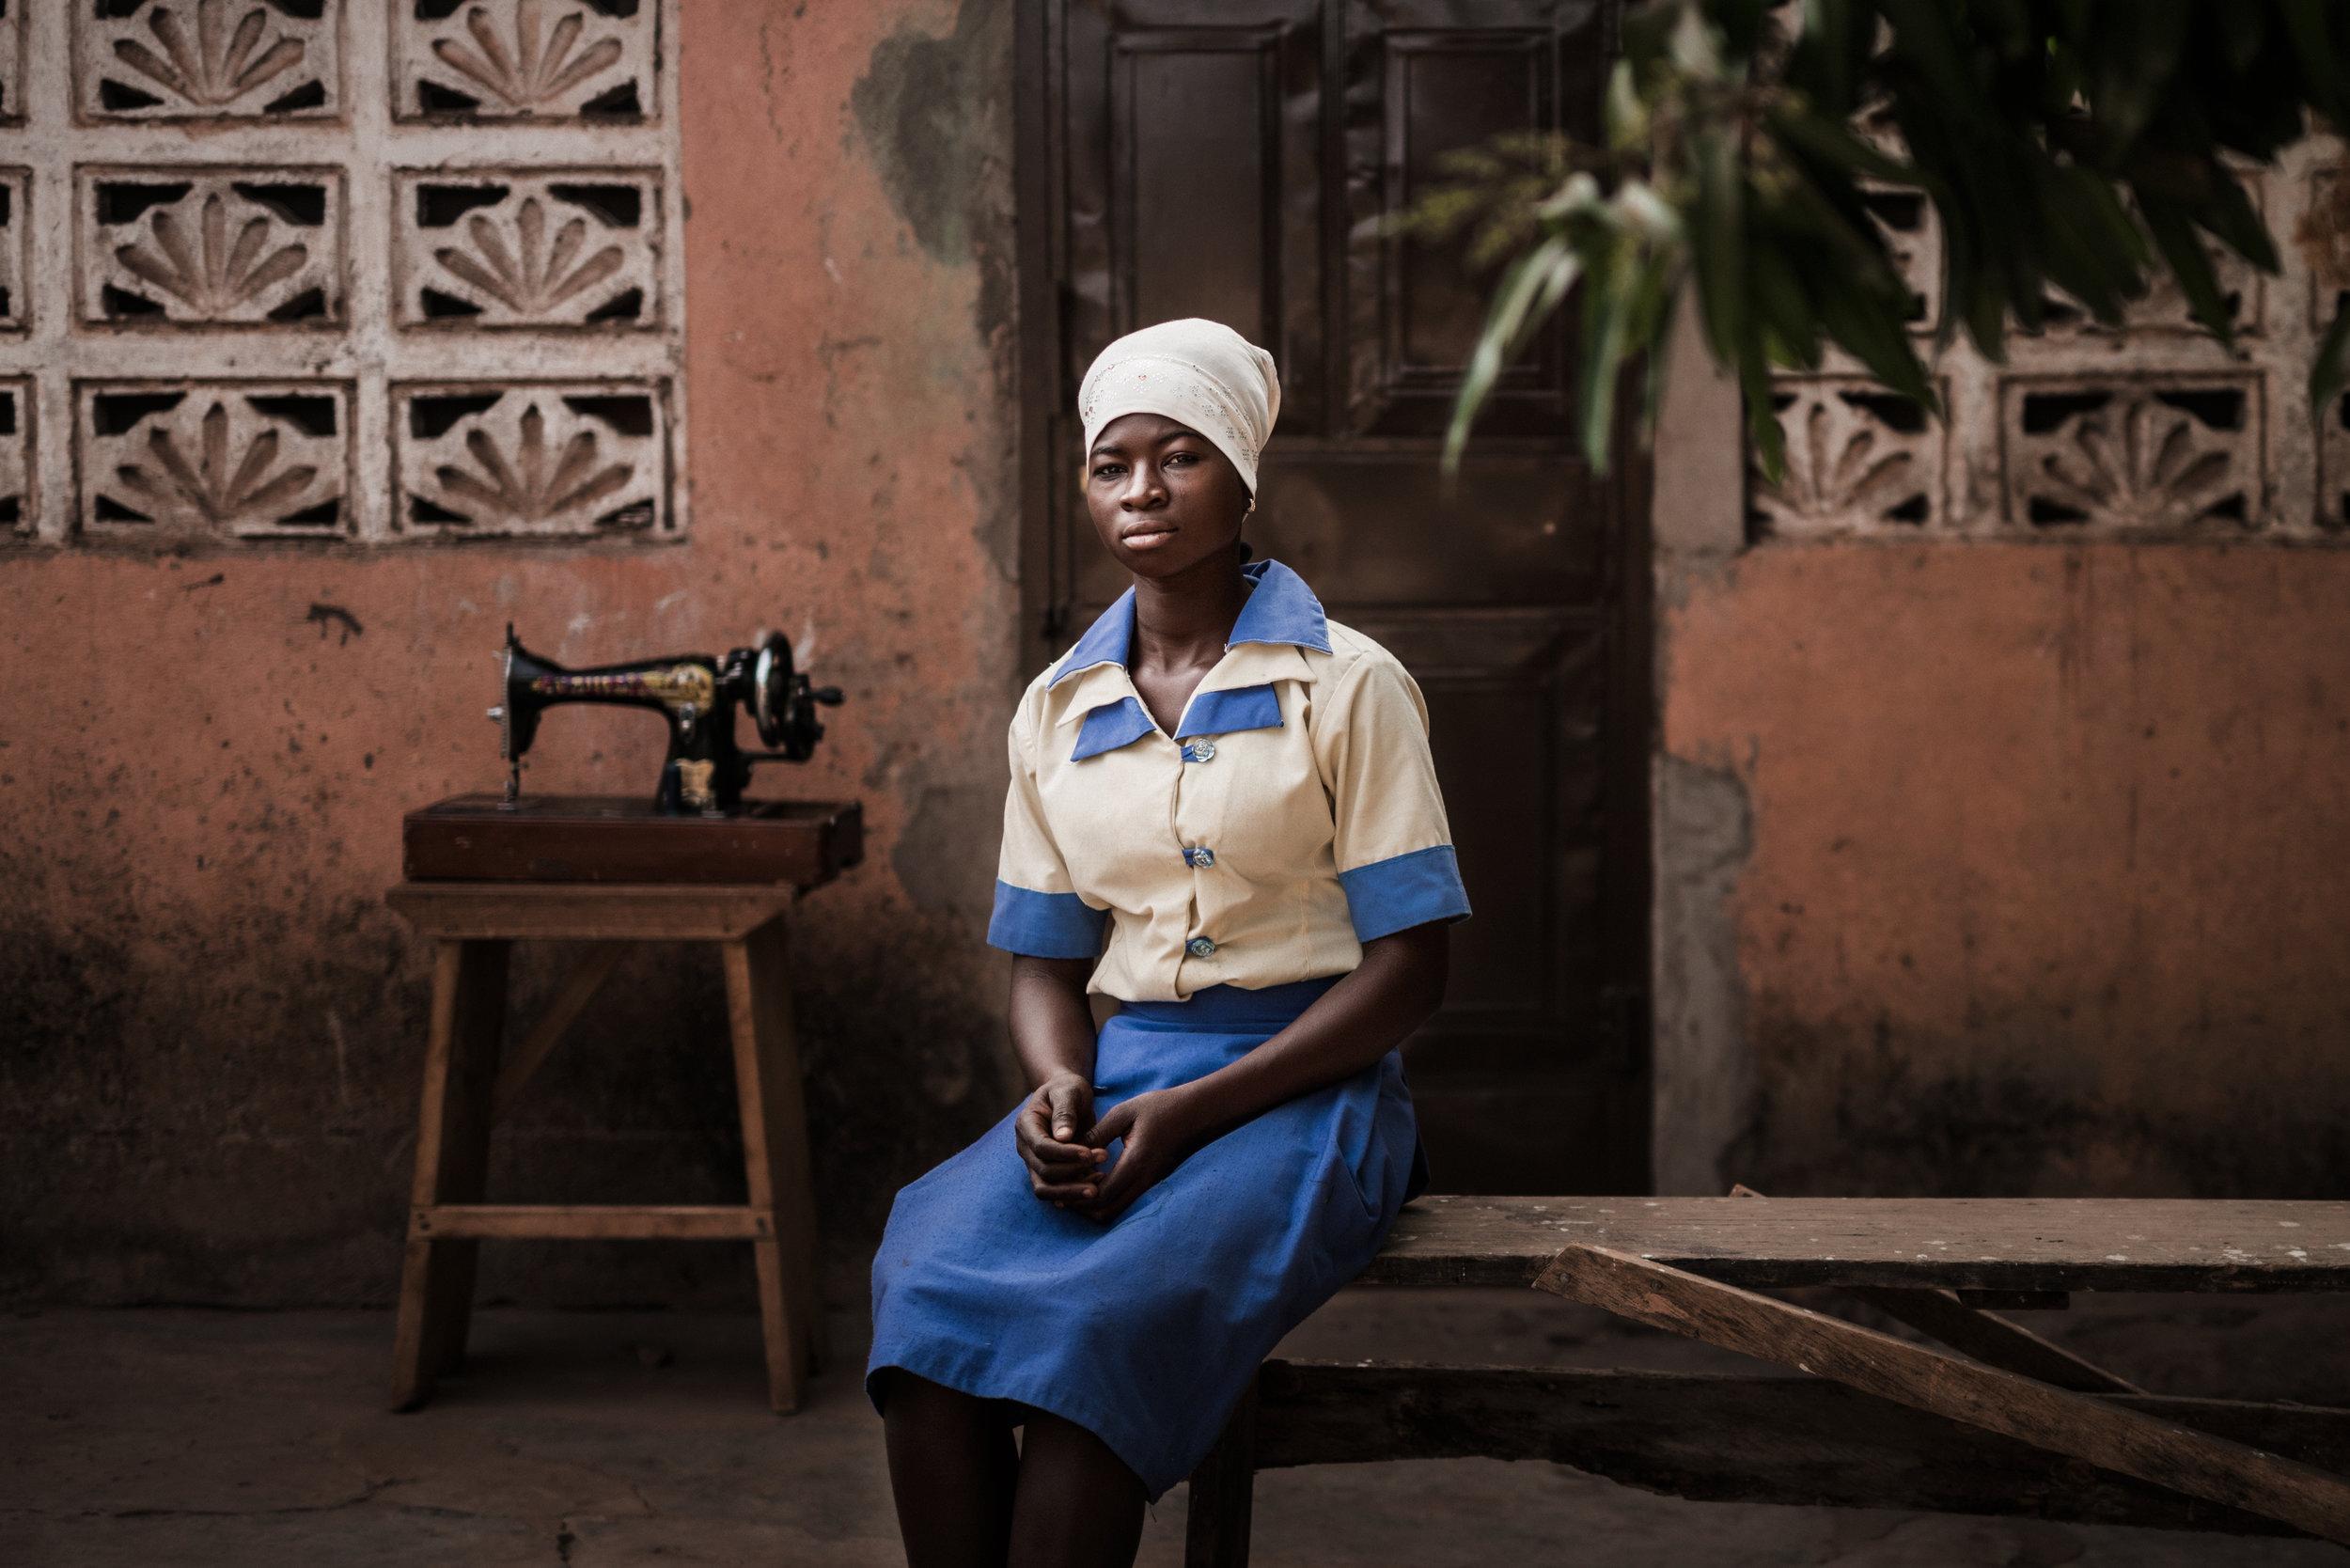 TaraShupe_HumanitarianPhotographer_Woman_Photographer_National_Geographic_Ghana_Women_063.jpg